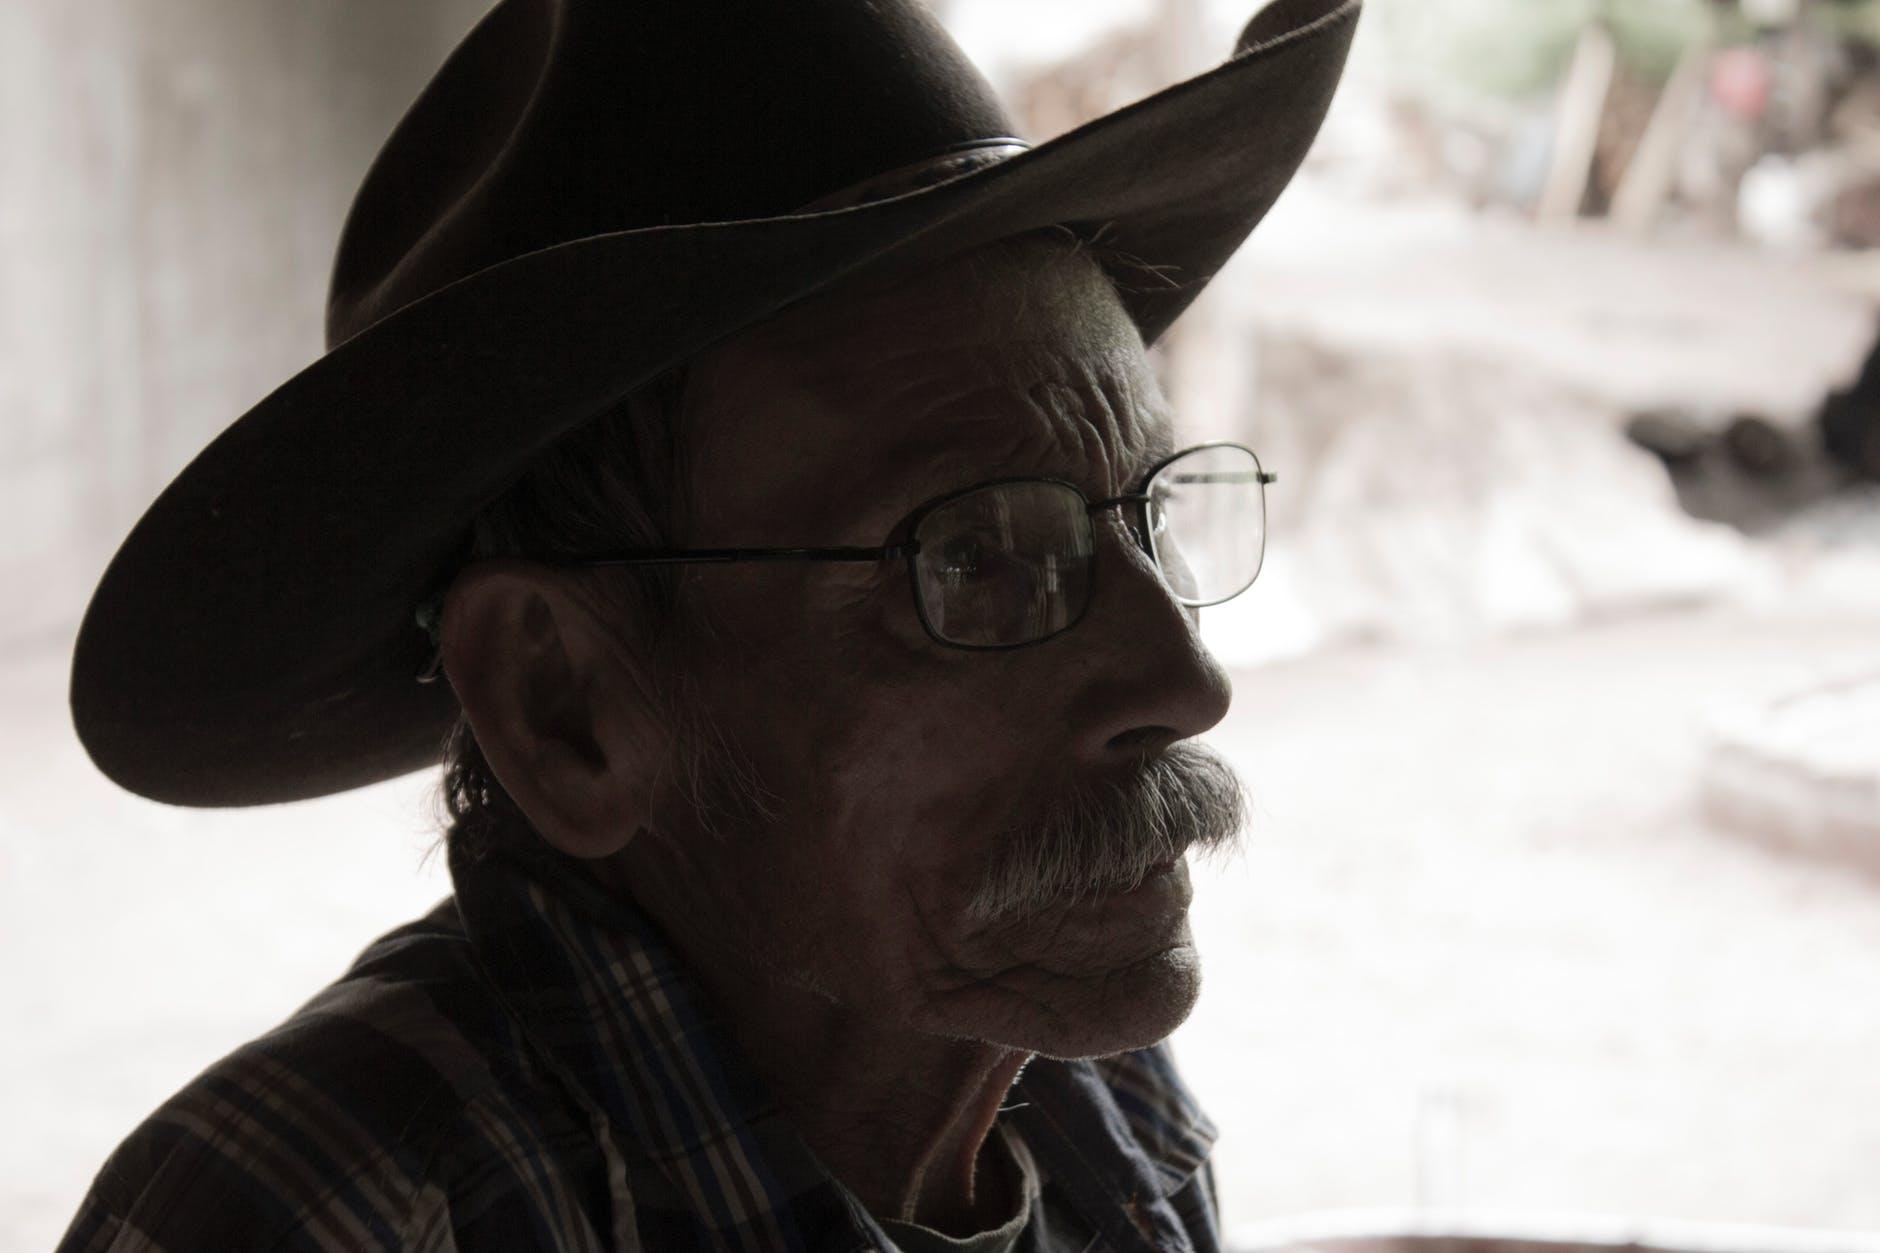 Älterer Mann, Cowboy - Foto: Pexels